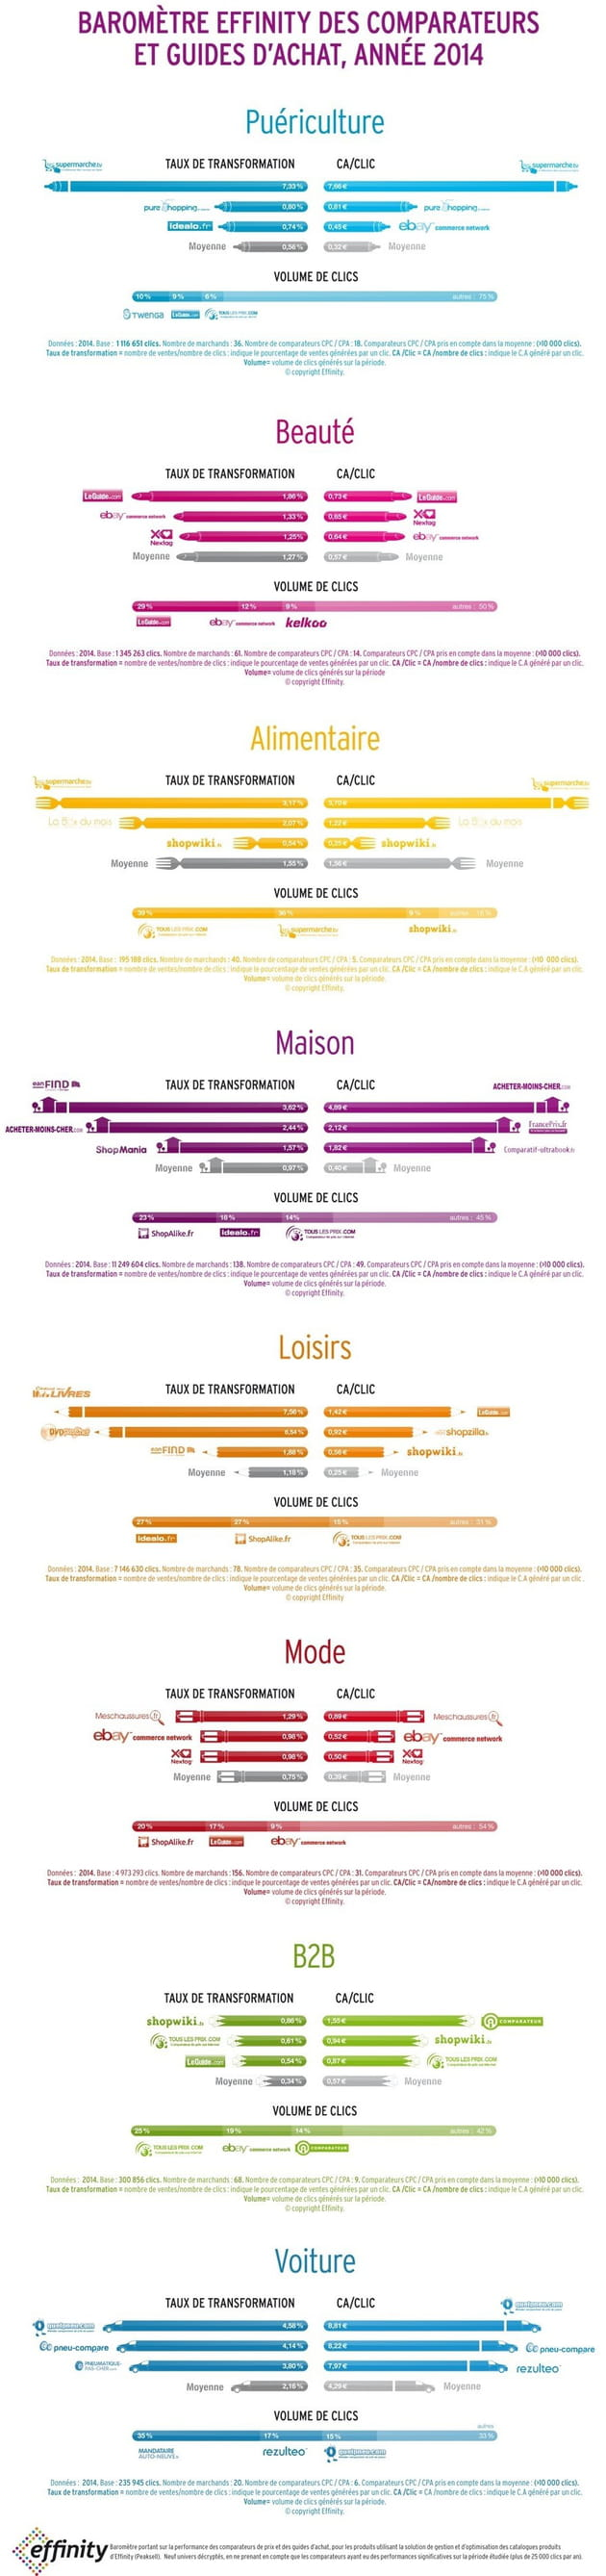 infographie effinity comparateurs essai